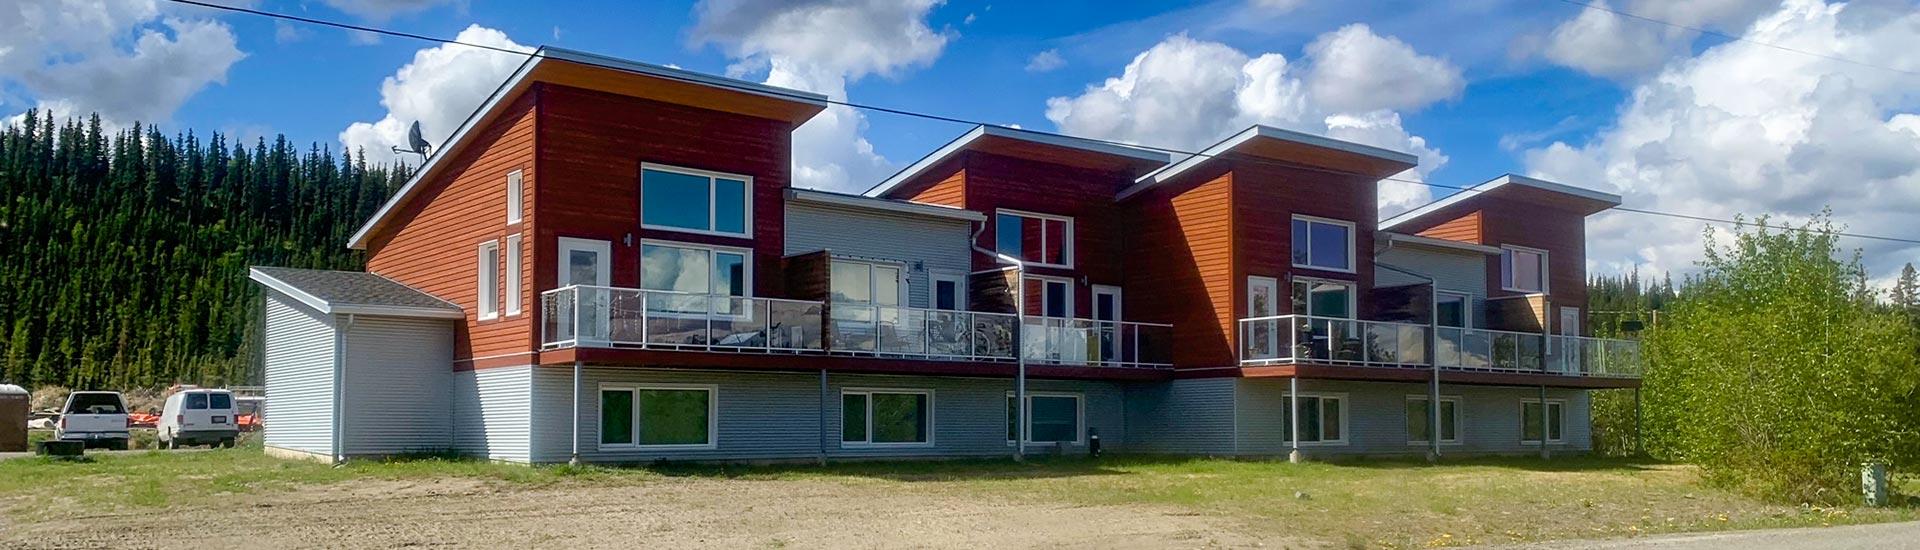 Riverbend Homes, Carmacks